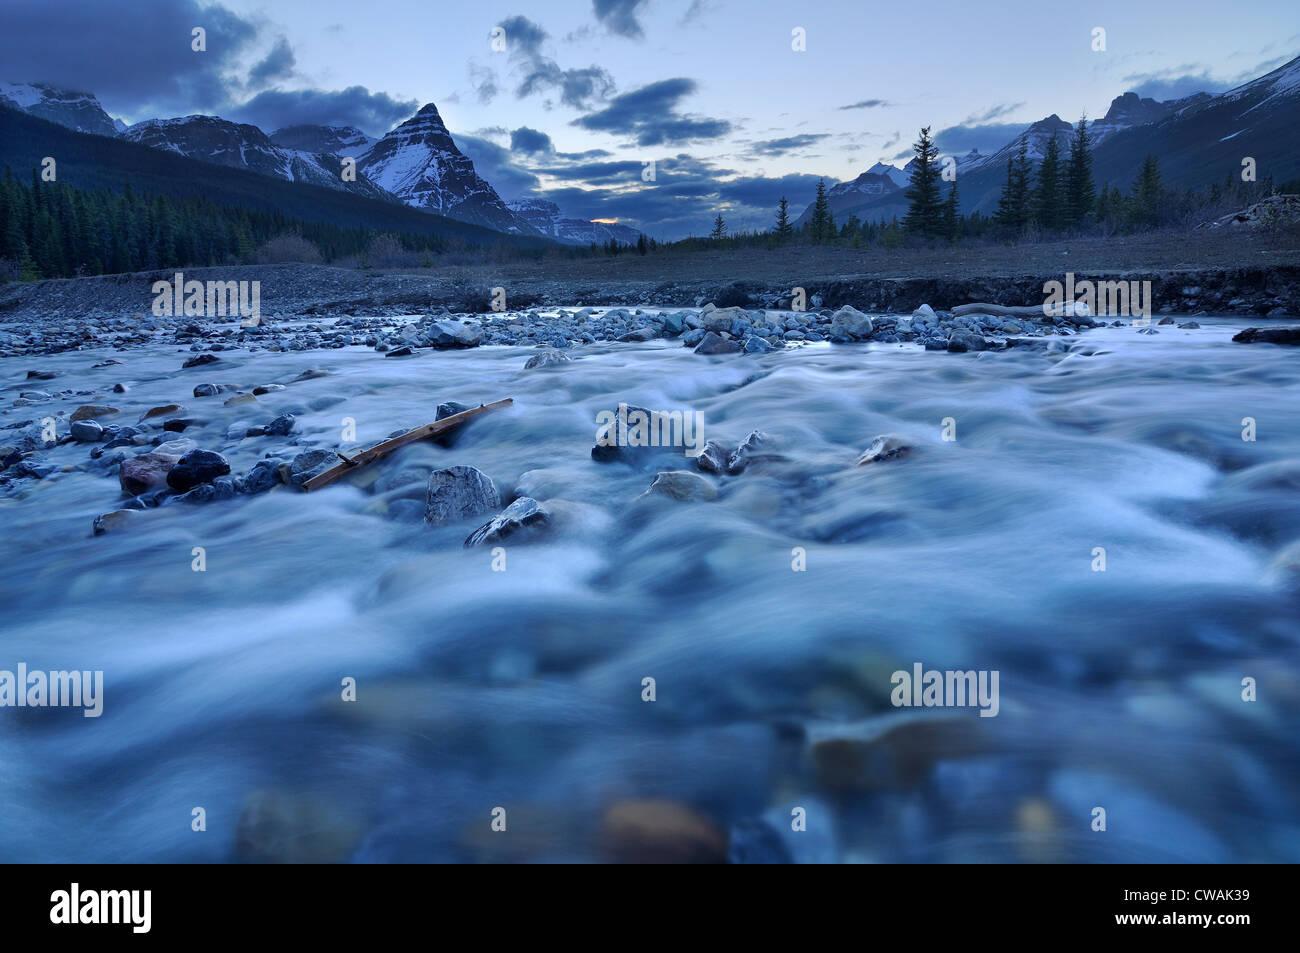 Silverhorn Creek, Banff National Park, Alberta, Canada - Stock Image